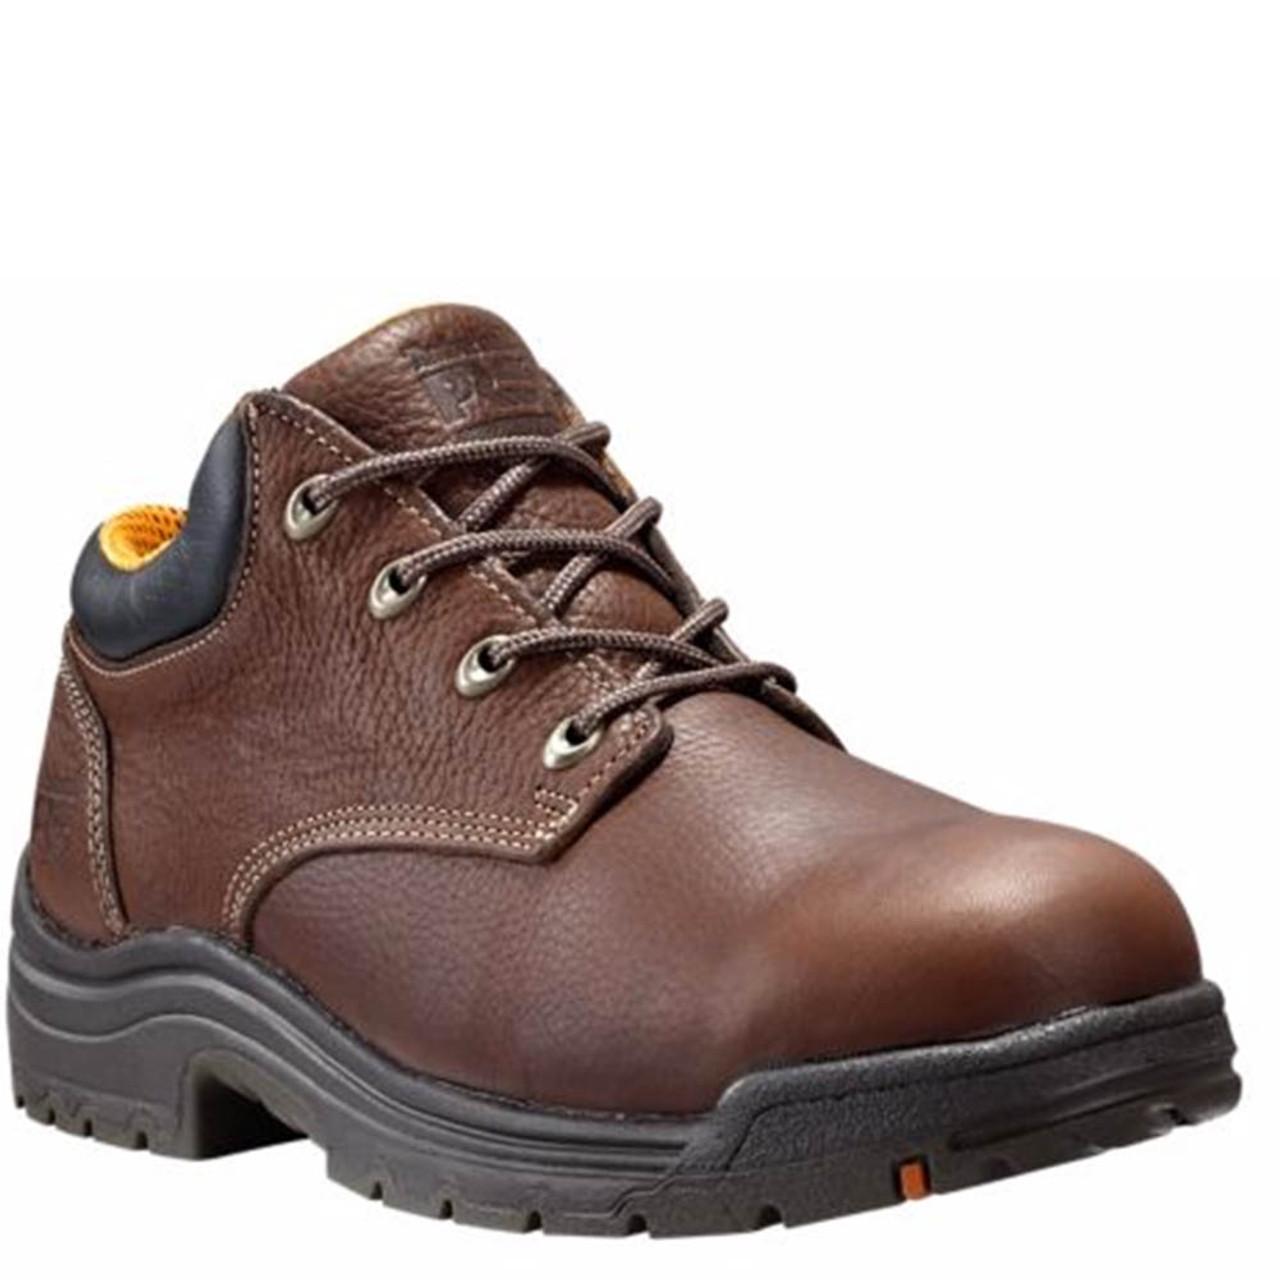 Timberland PRO 47028 TITAN Alloy Safety